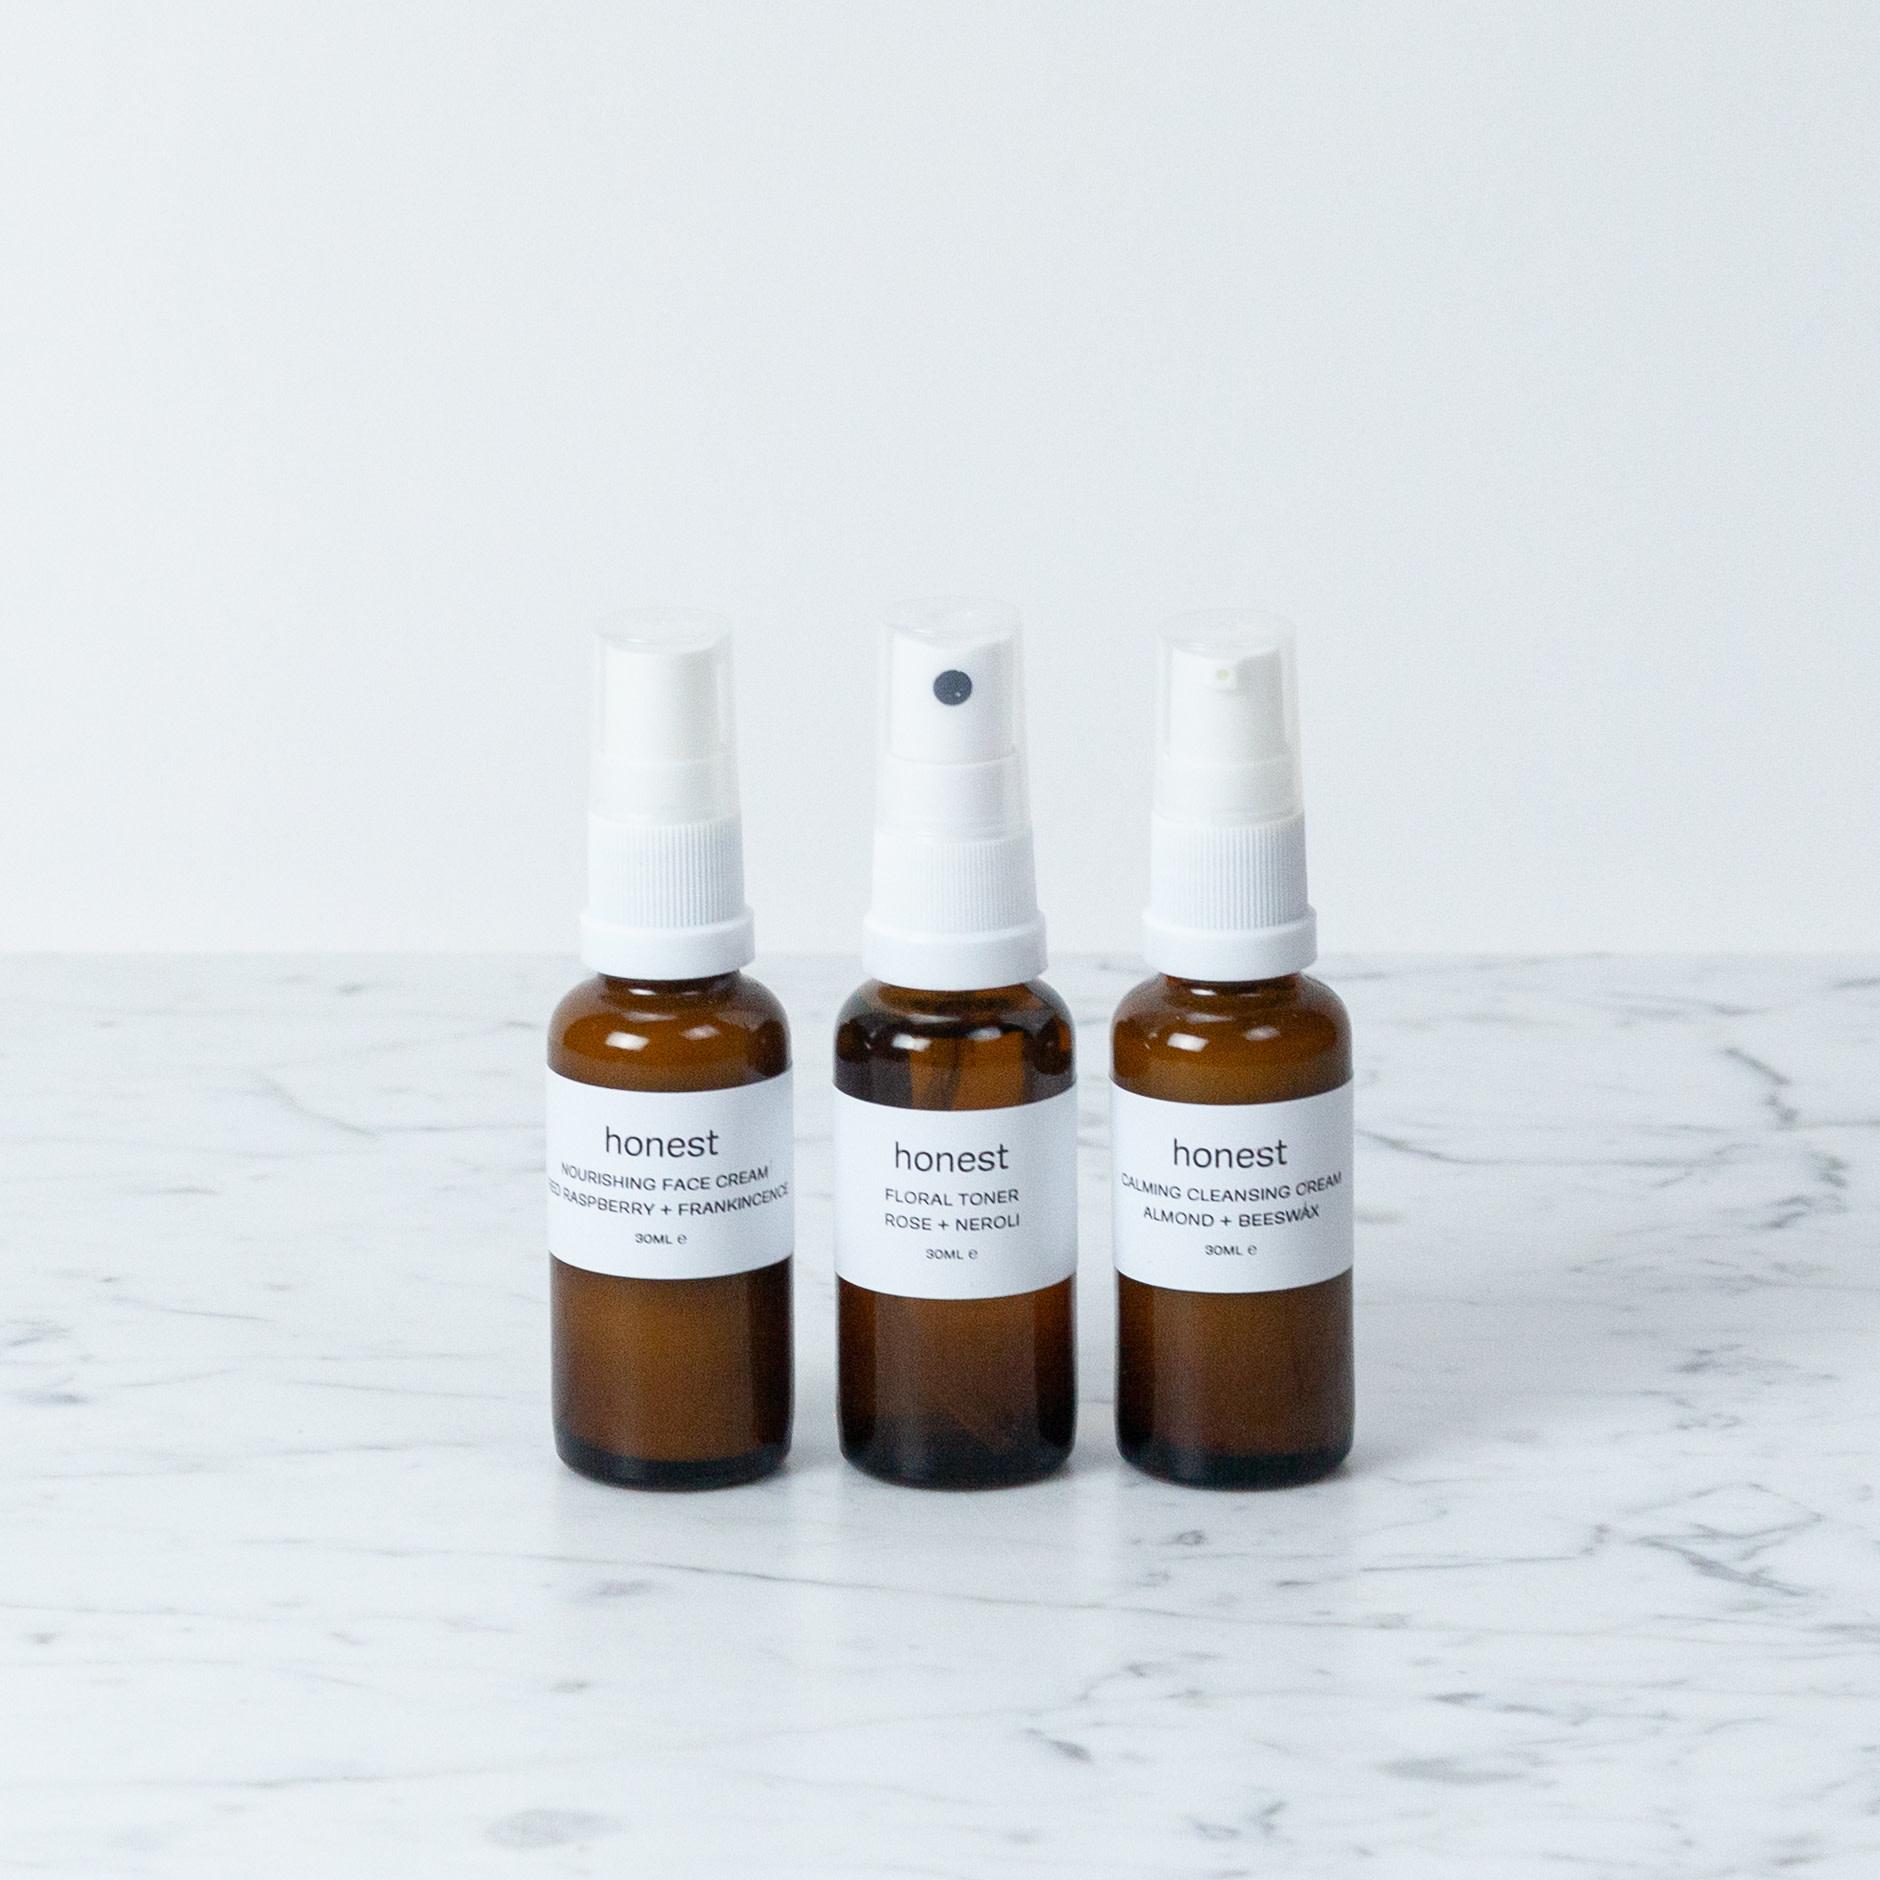 Honest Mini Face Ritual Set - Nourishing - 30 ml each